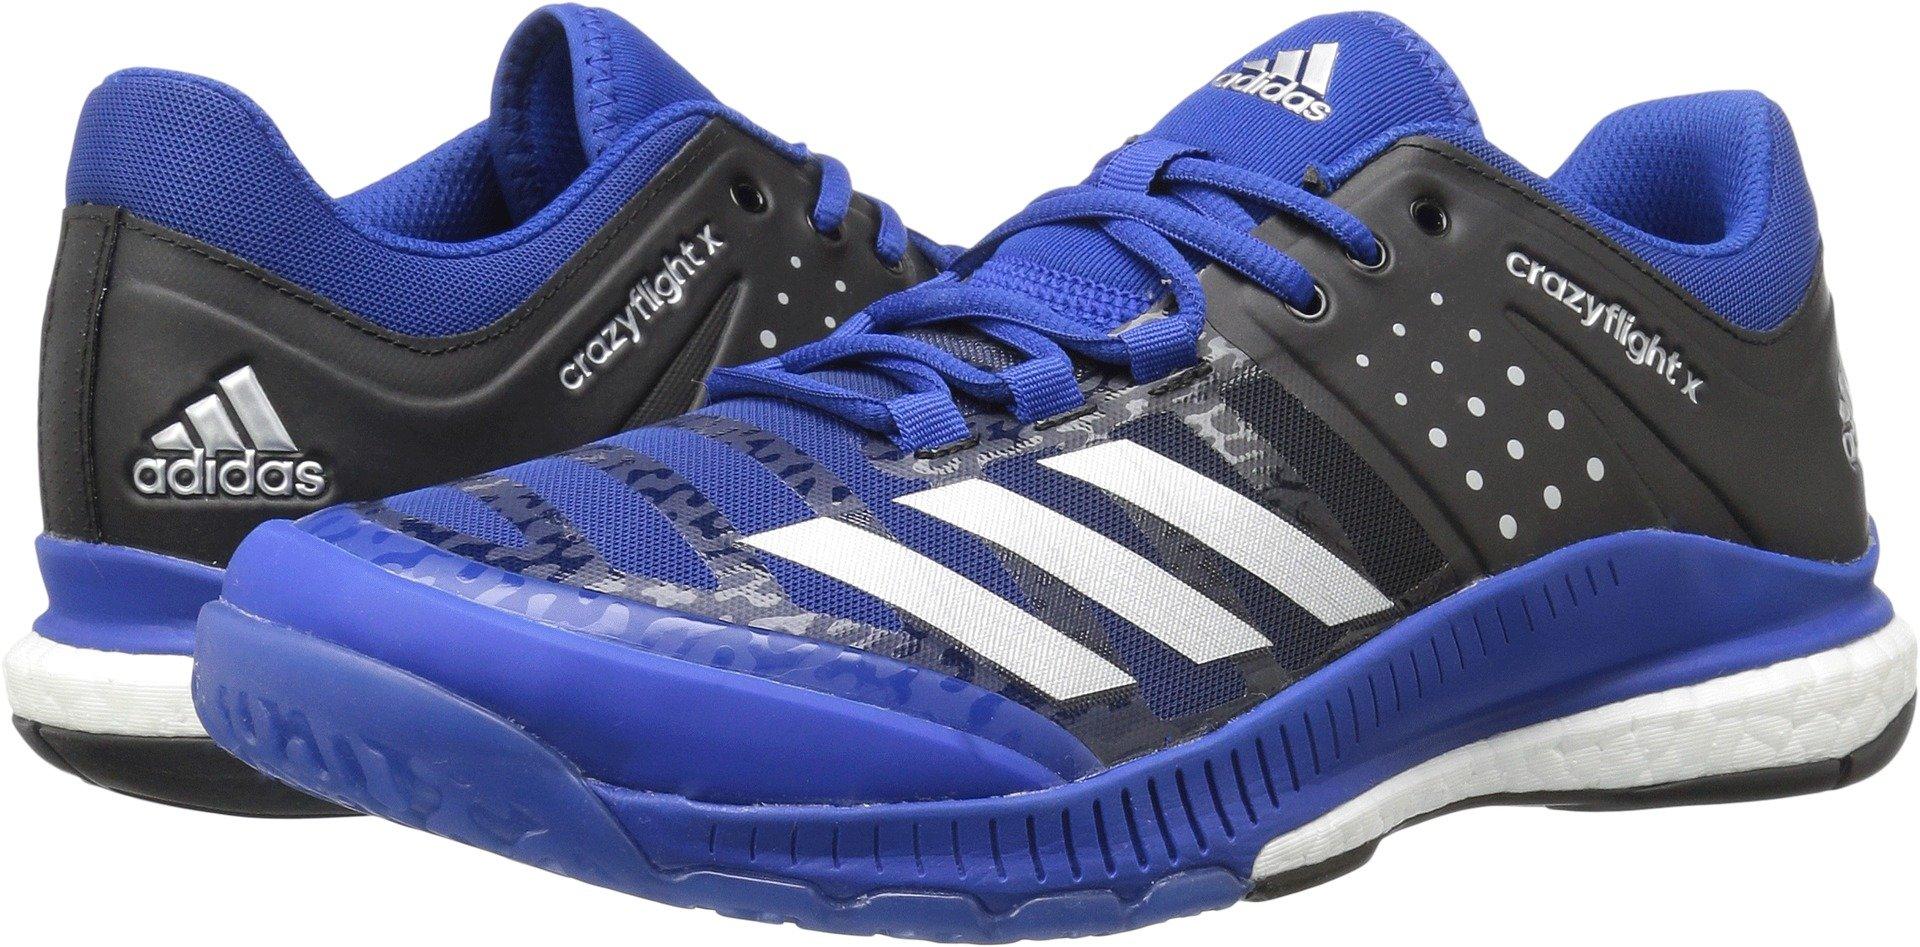 adidas Women's Crazyflight X Cross-Trainer-Shoes,Collegiate Royal/Metallic Silver/Black,8.5